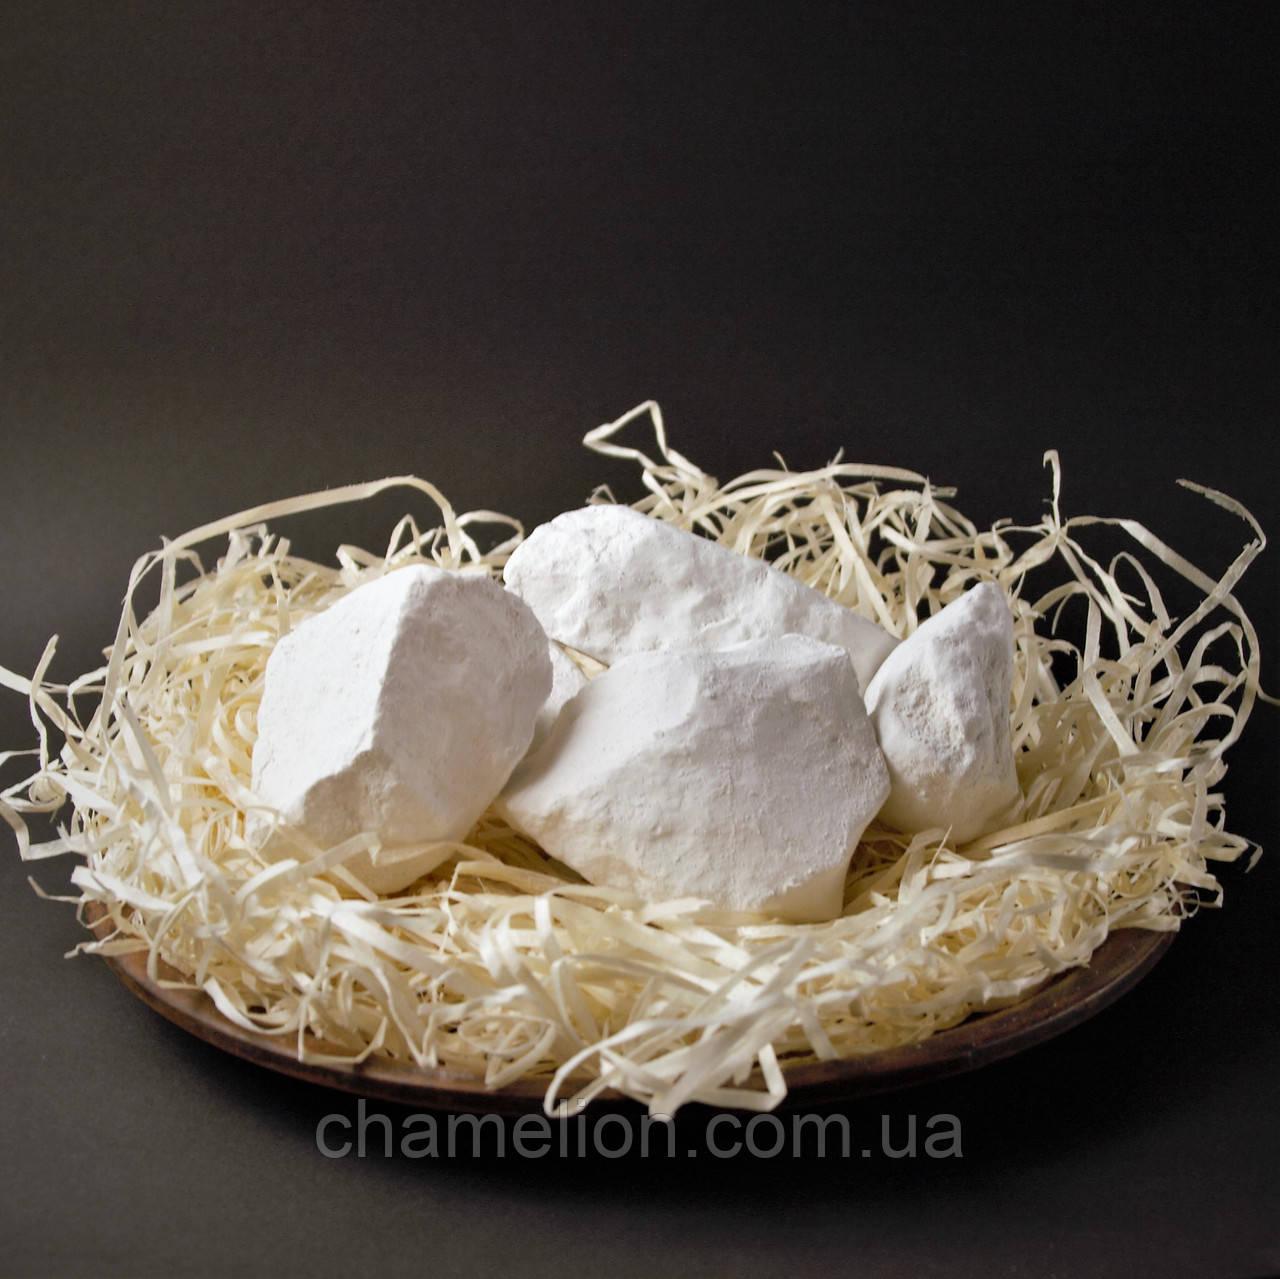 Крейда харчова Кам'янка 1 кг (Мел пищевой Каменка 1 кг)